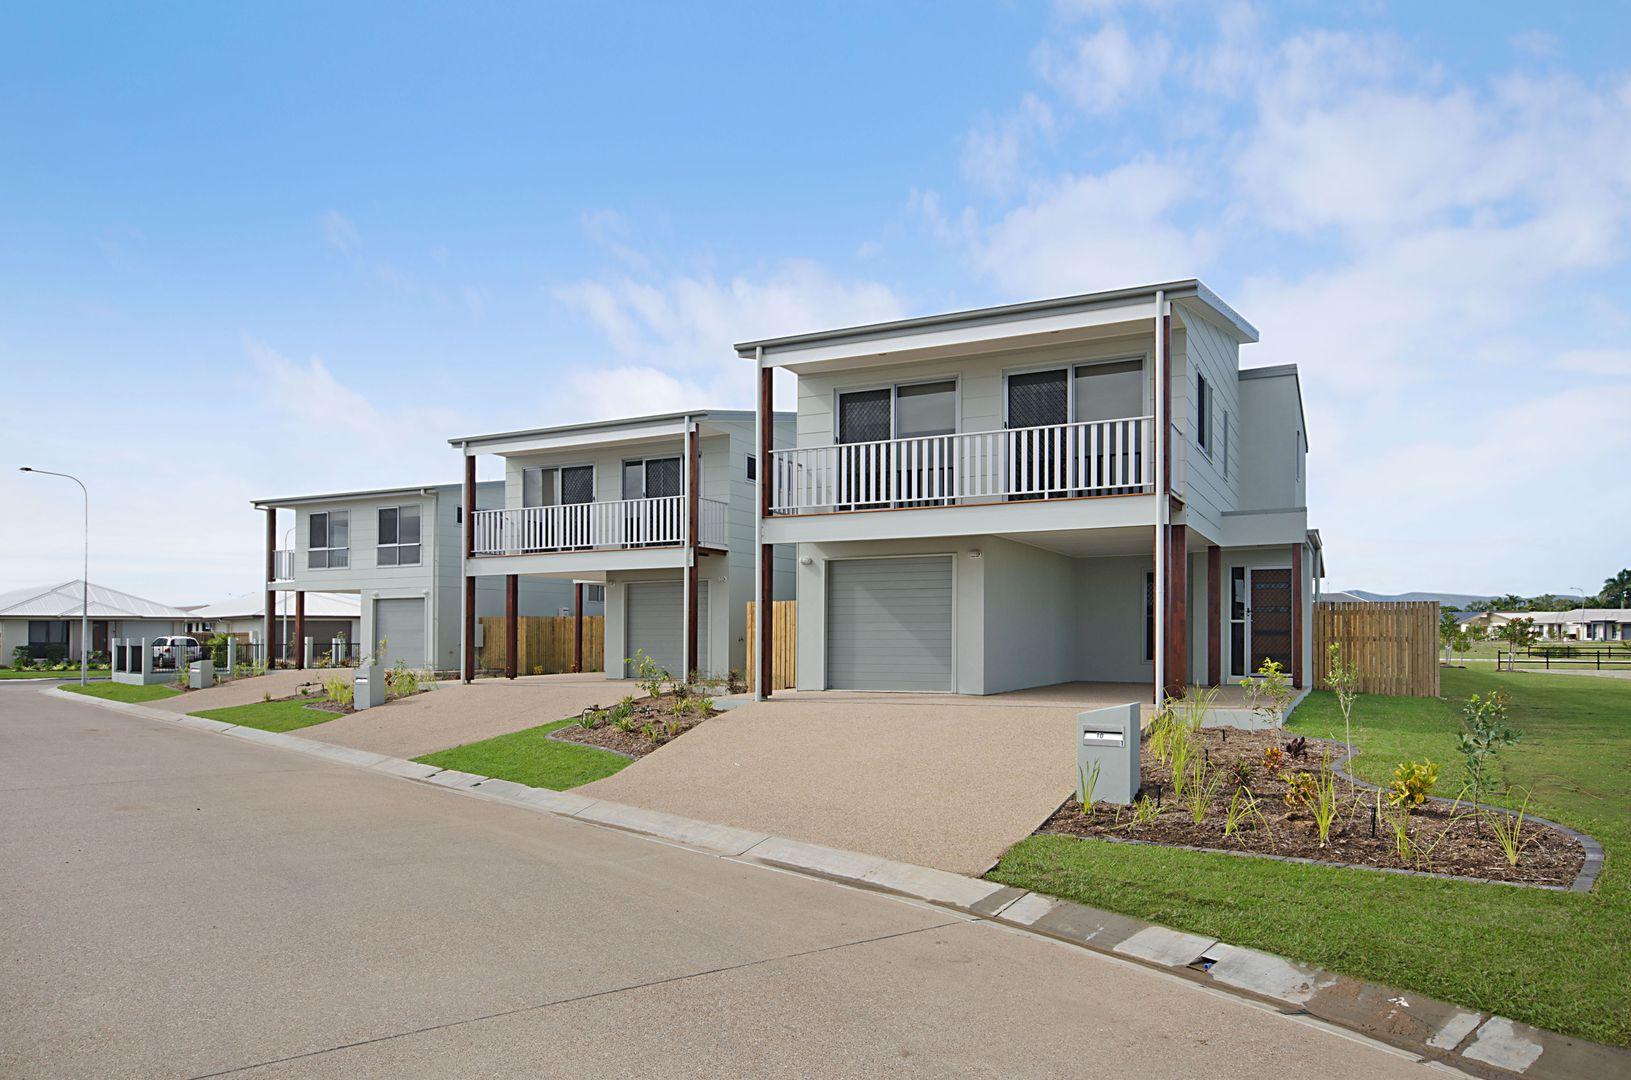 2/10 Brooke Lane, Burdell QLD 4818, Image 0